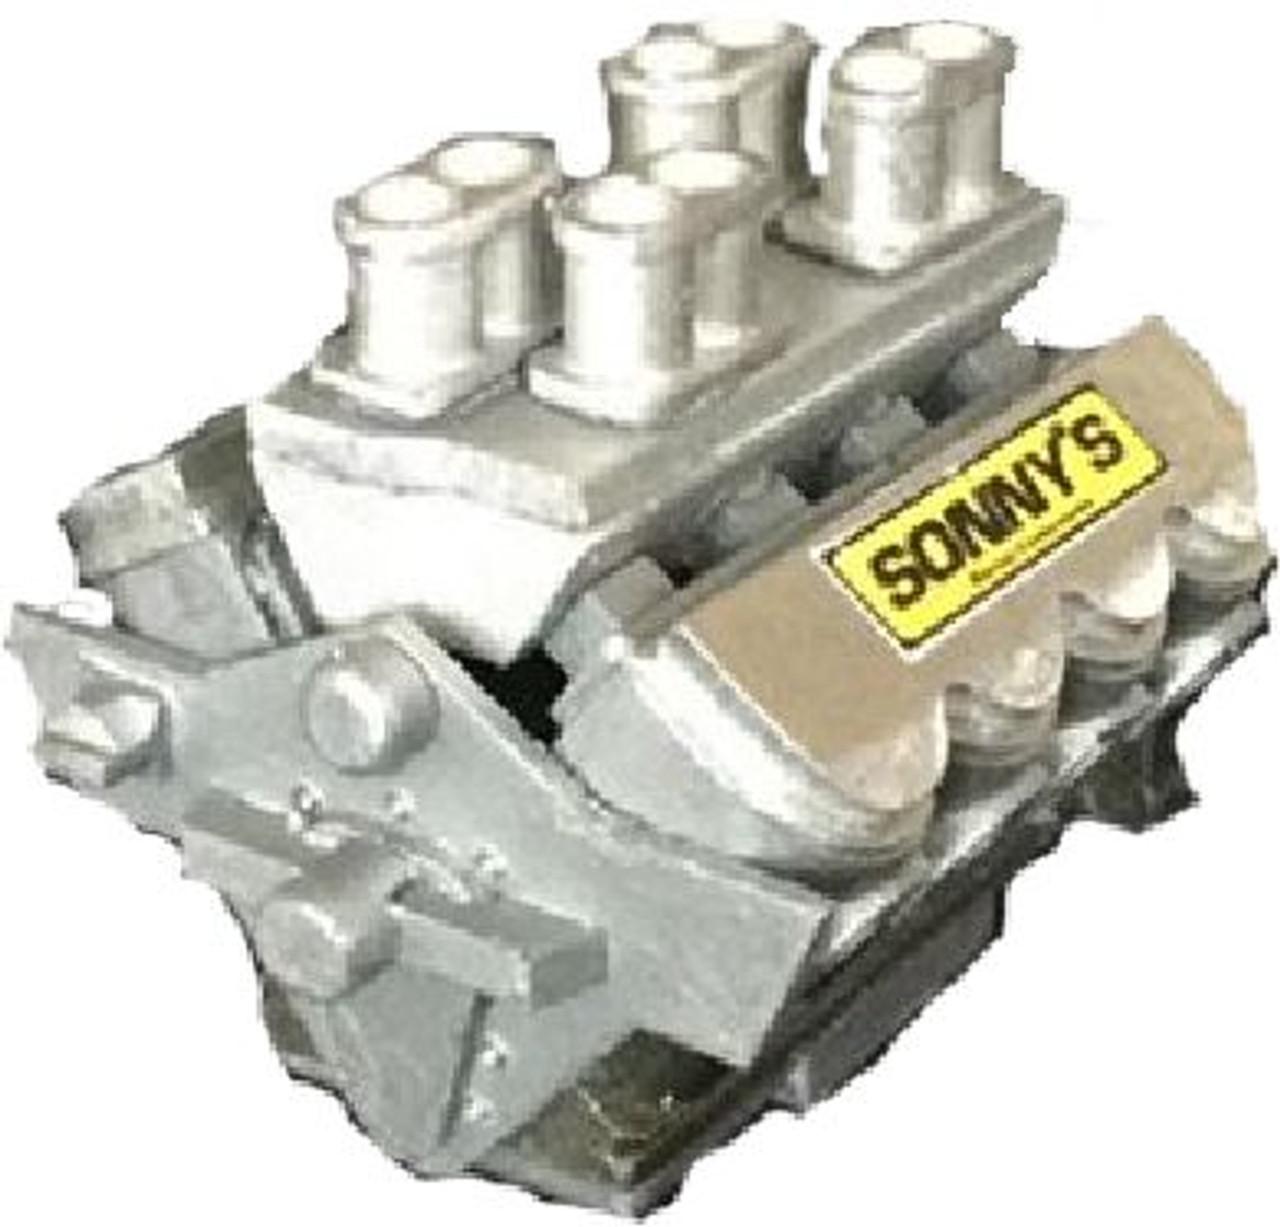 Sonny's 959 BB Pro Mod Engine 1/25